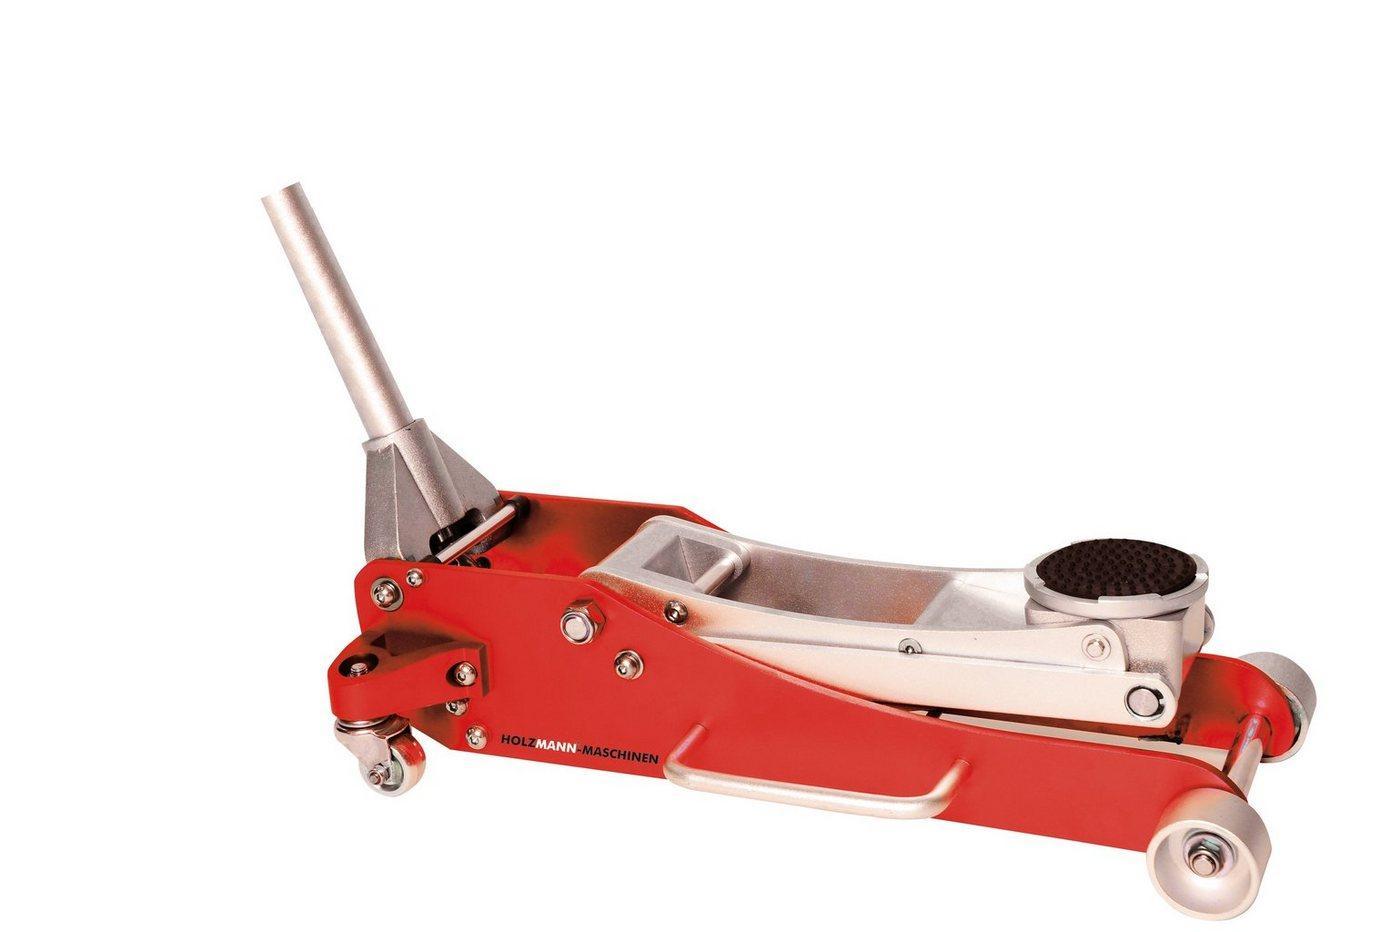 Holzmann Rangierwagenheber »RWH180ALU«, max. Hubhöhe: 47 cm, bis 1,8 t